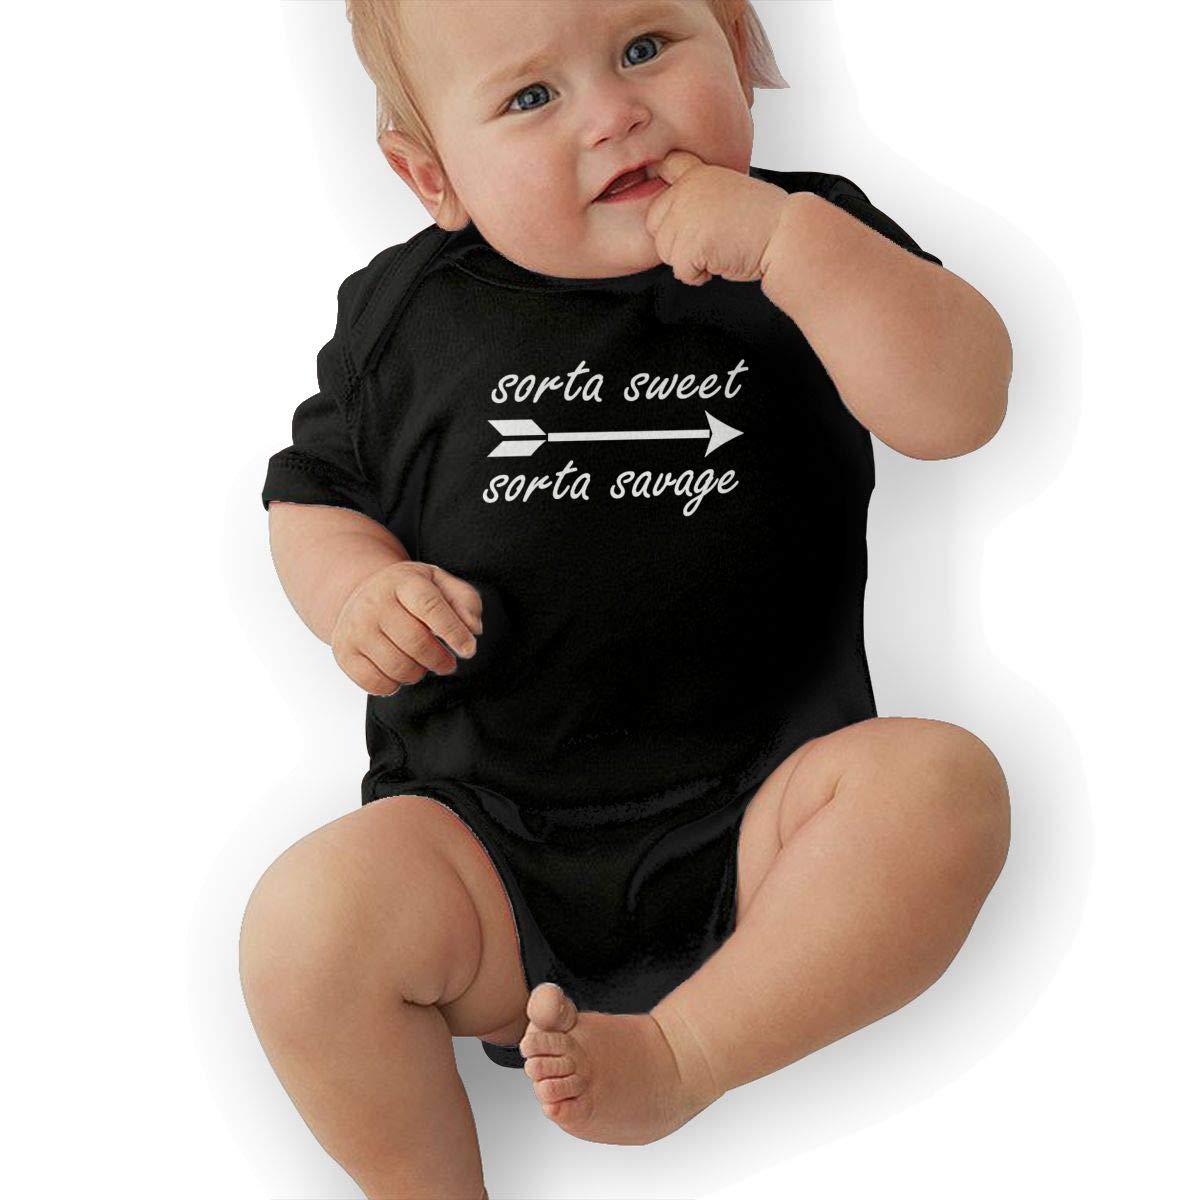 Bodysuits Clothes Onesies Jumpsuits Outfits Black HappyLifea Sorta Sweet Sorta Savage Logo Baby Pajamas